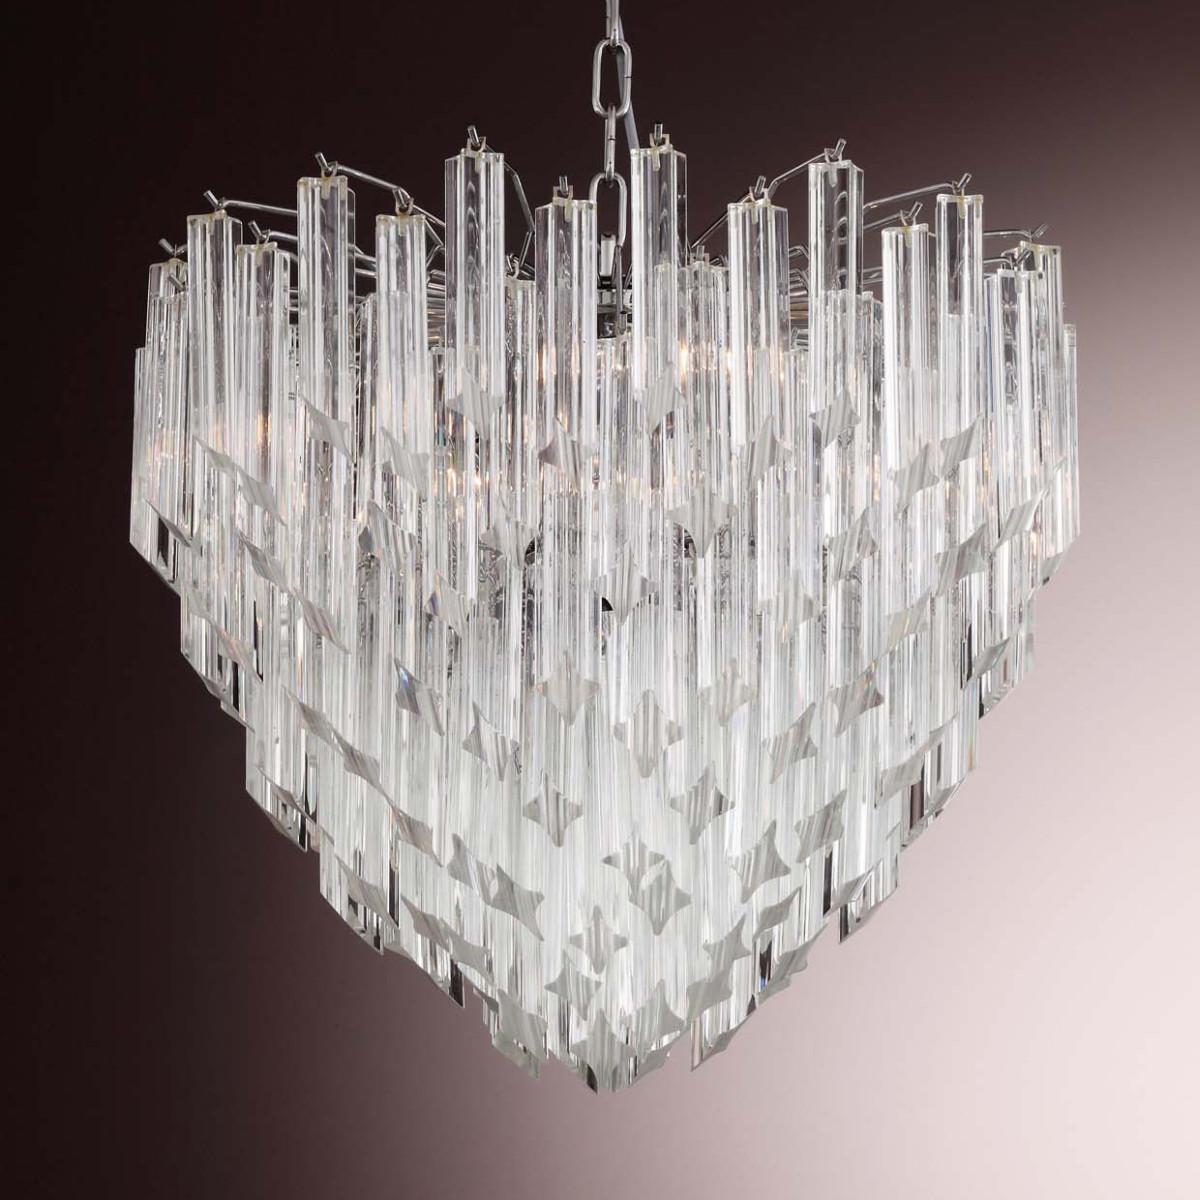 """Nelly"" lampara de cristal de Murano - 6 luces - transparente"